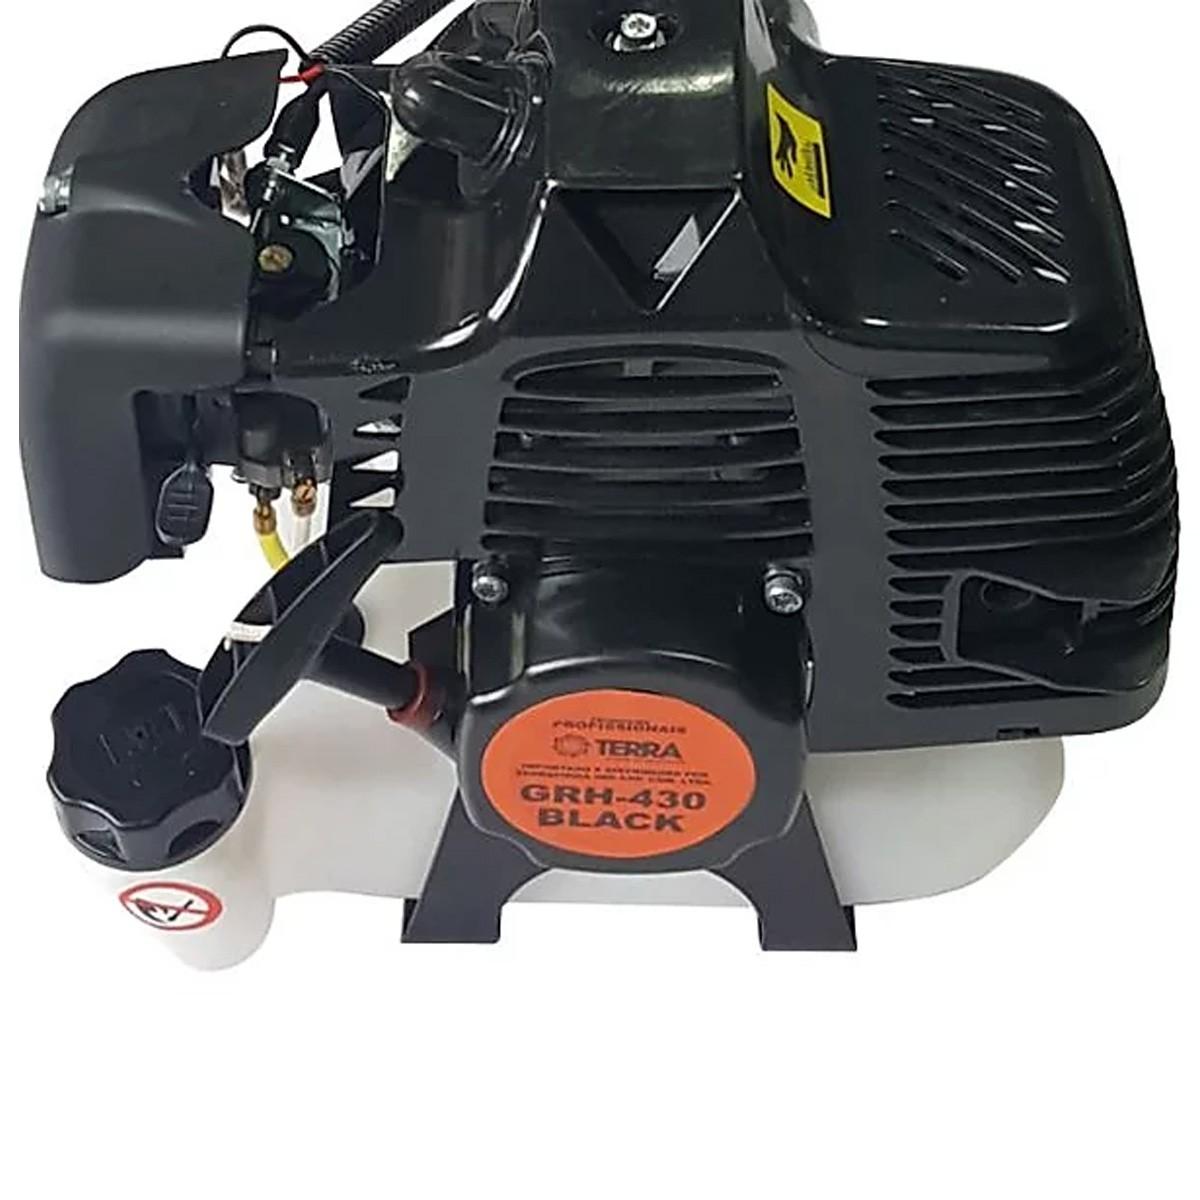 Roçadeira Á Gasolina Corta Grama 42cc Motor 2t- 1.6hp Terra